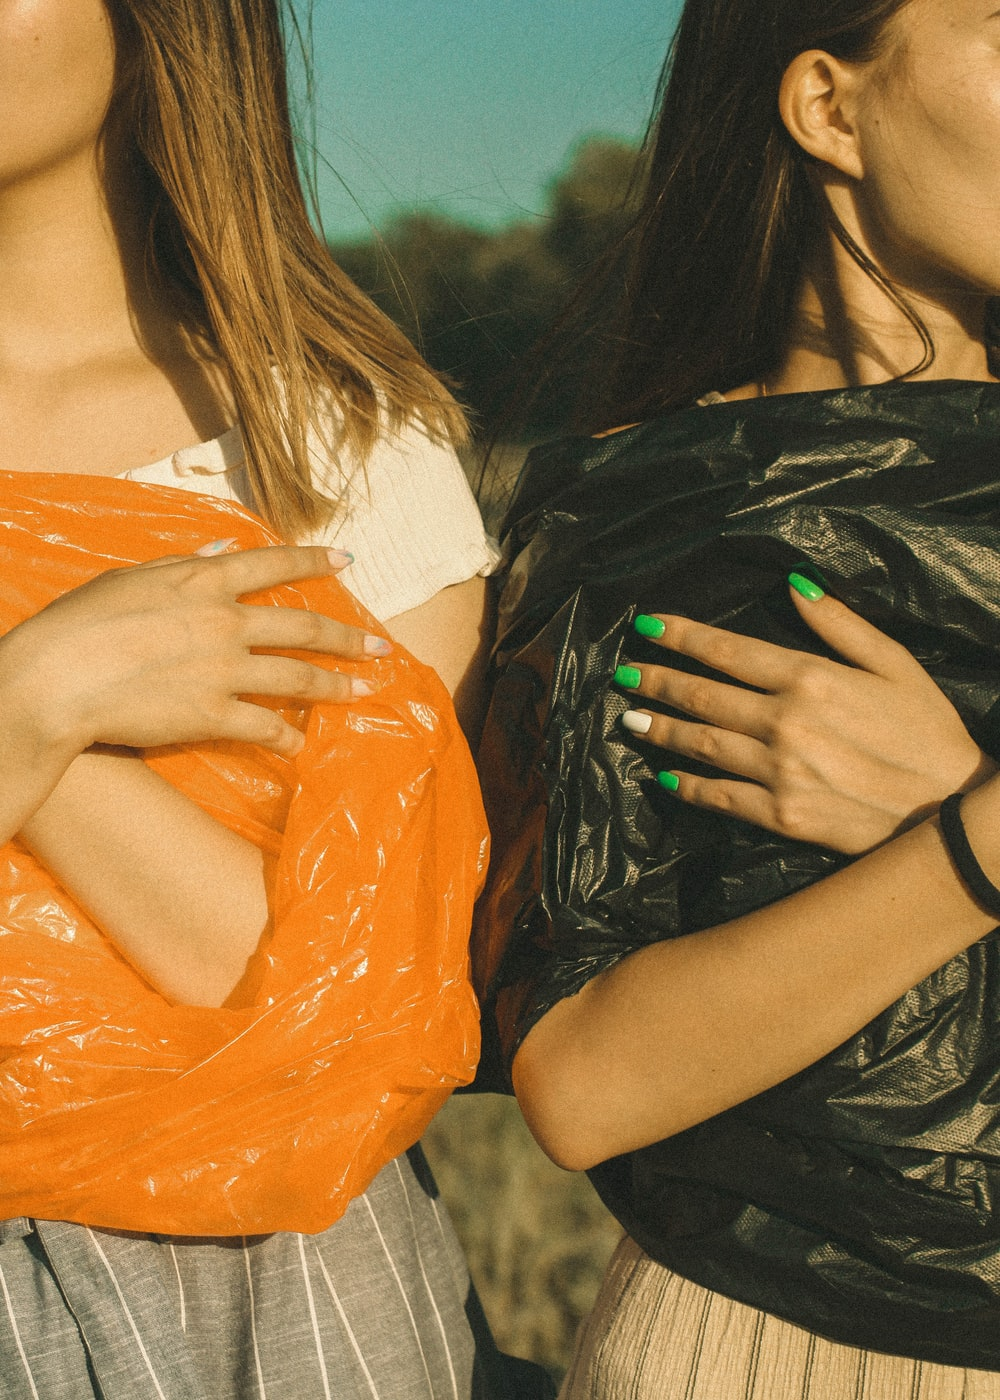 two women wearing black and orange plastic bags